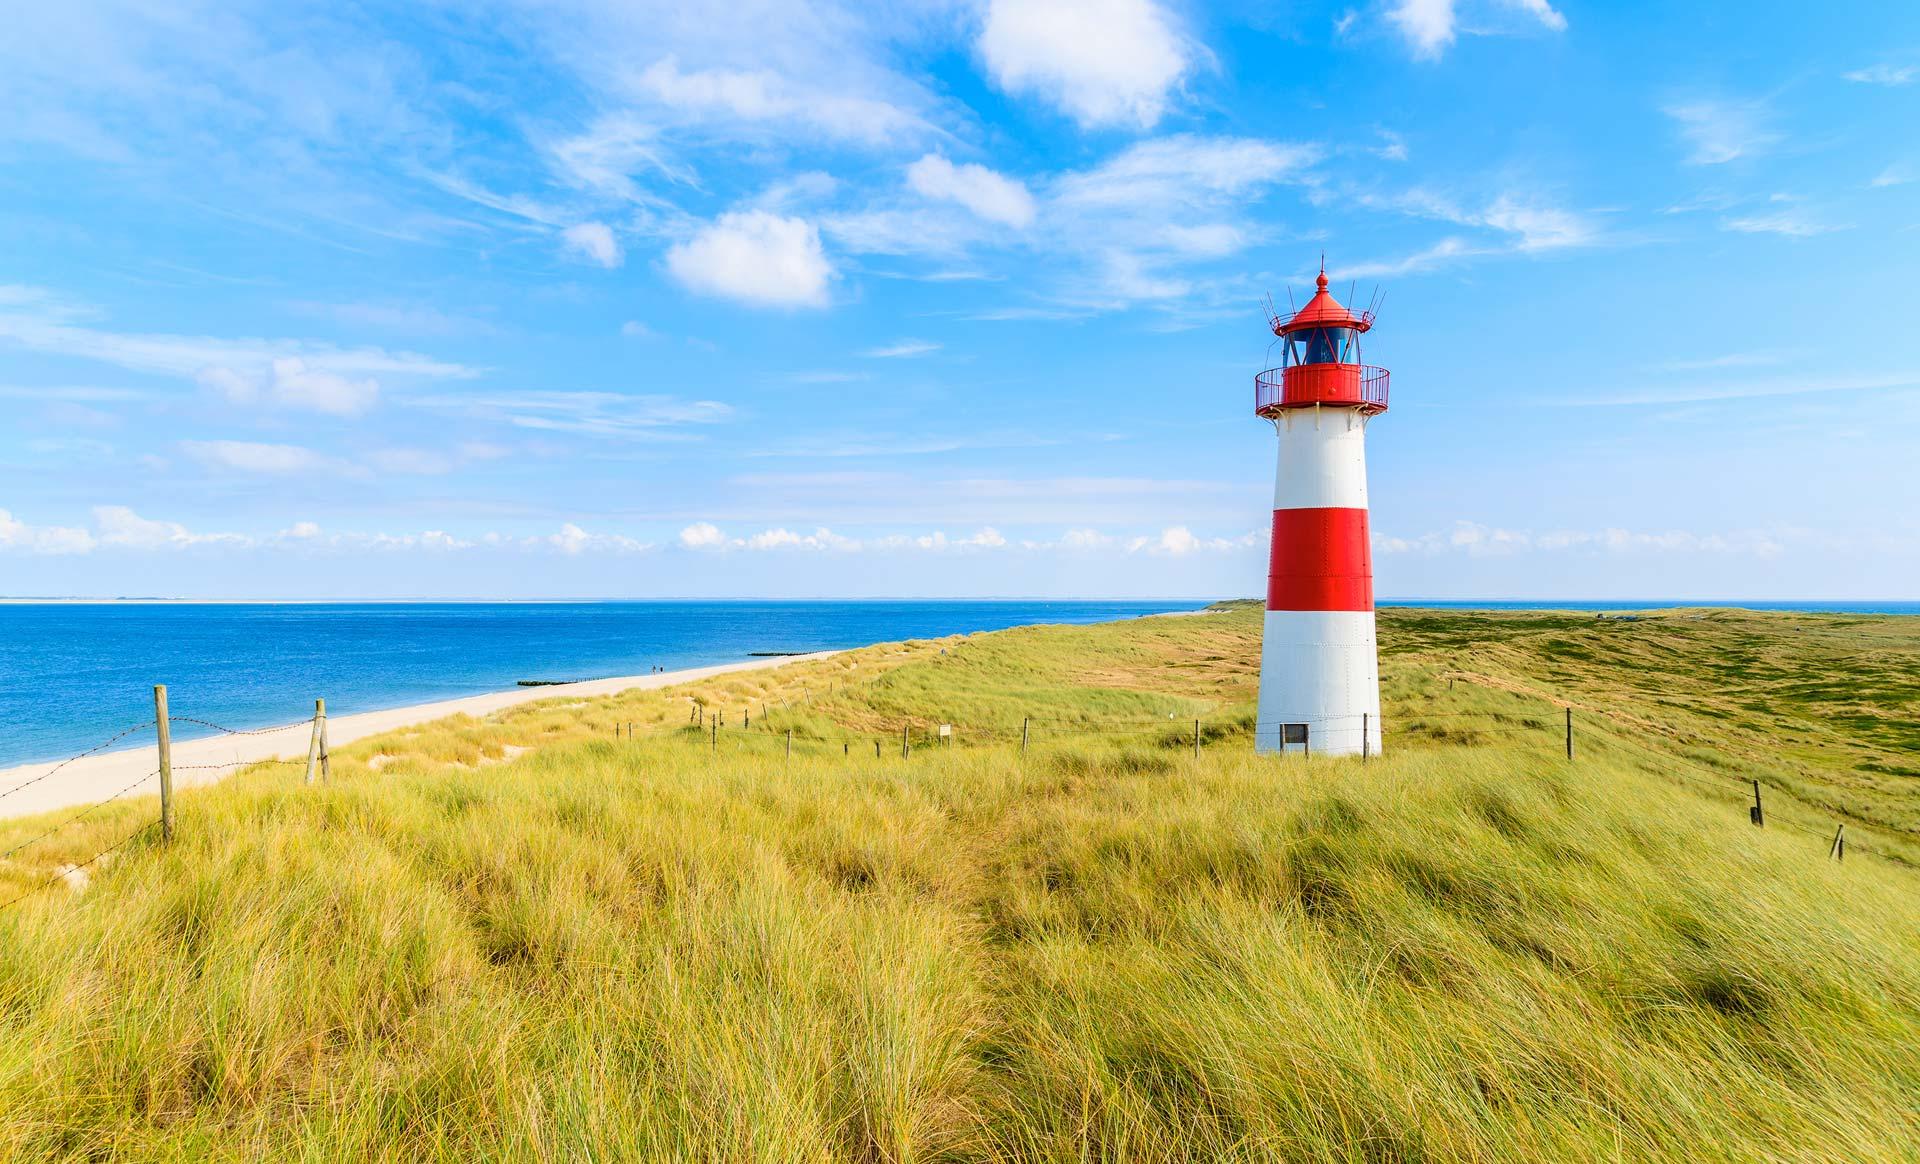 blog-lighthouse-on-sand-dune